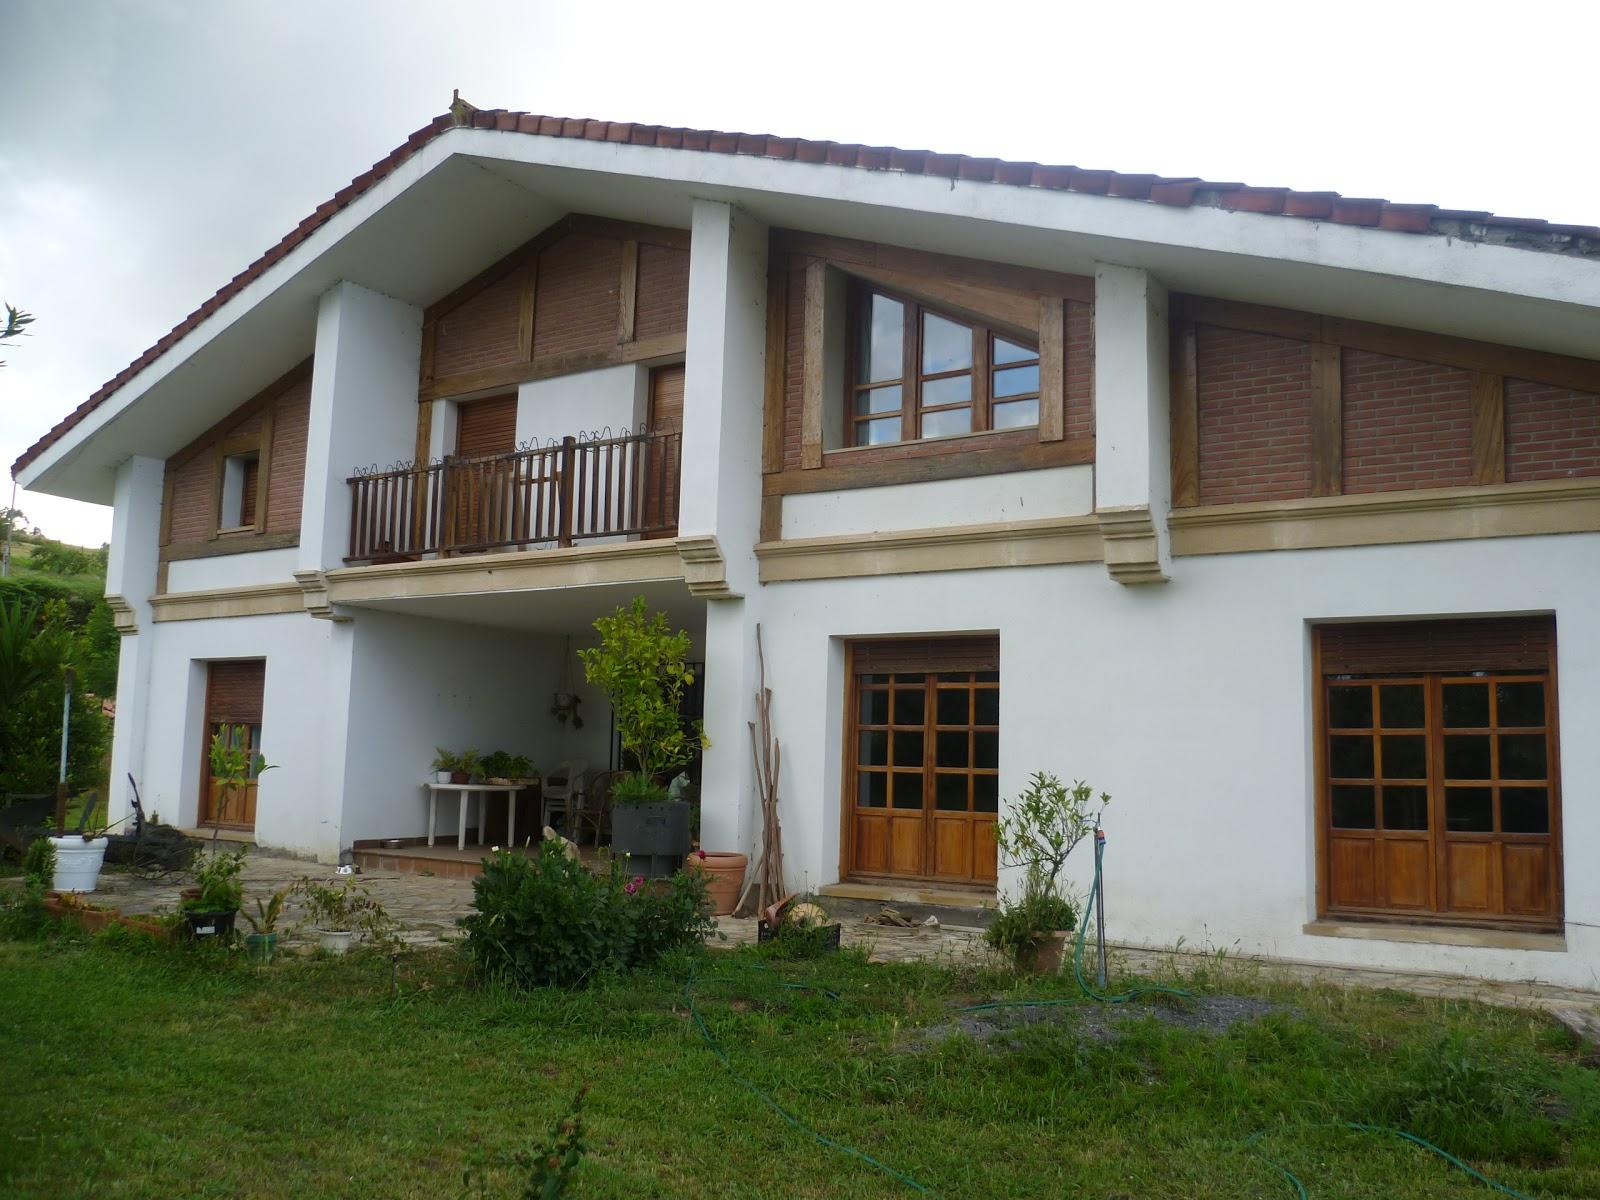 Arquitectura y dise o proyecto de rehabilitaci n de - Casa rural urduliz ...